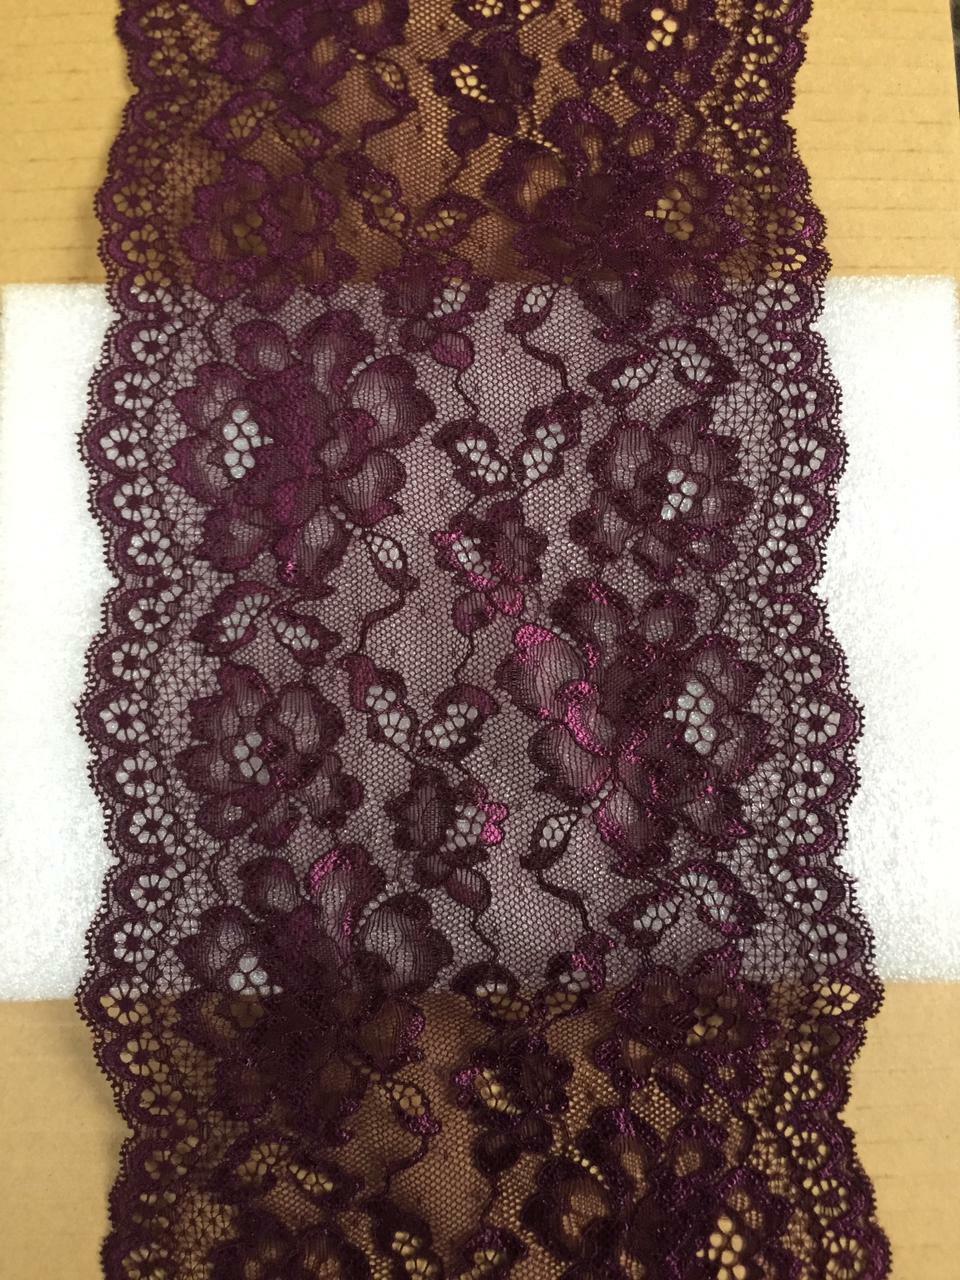 10m/1m elegante Stickerei Spitze Borte elastisch Dunkel violett 18cm NR